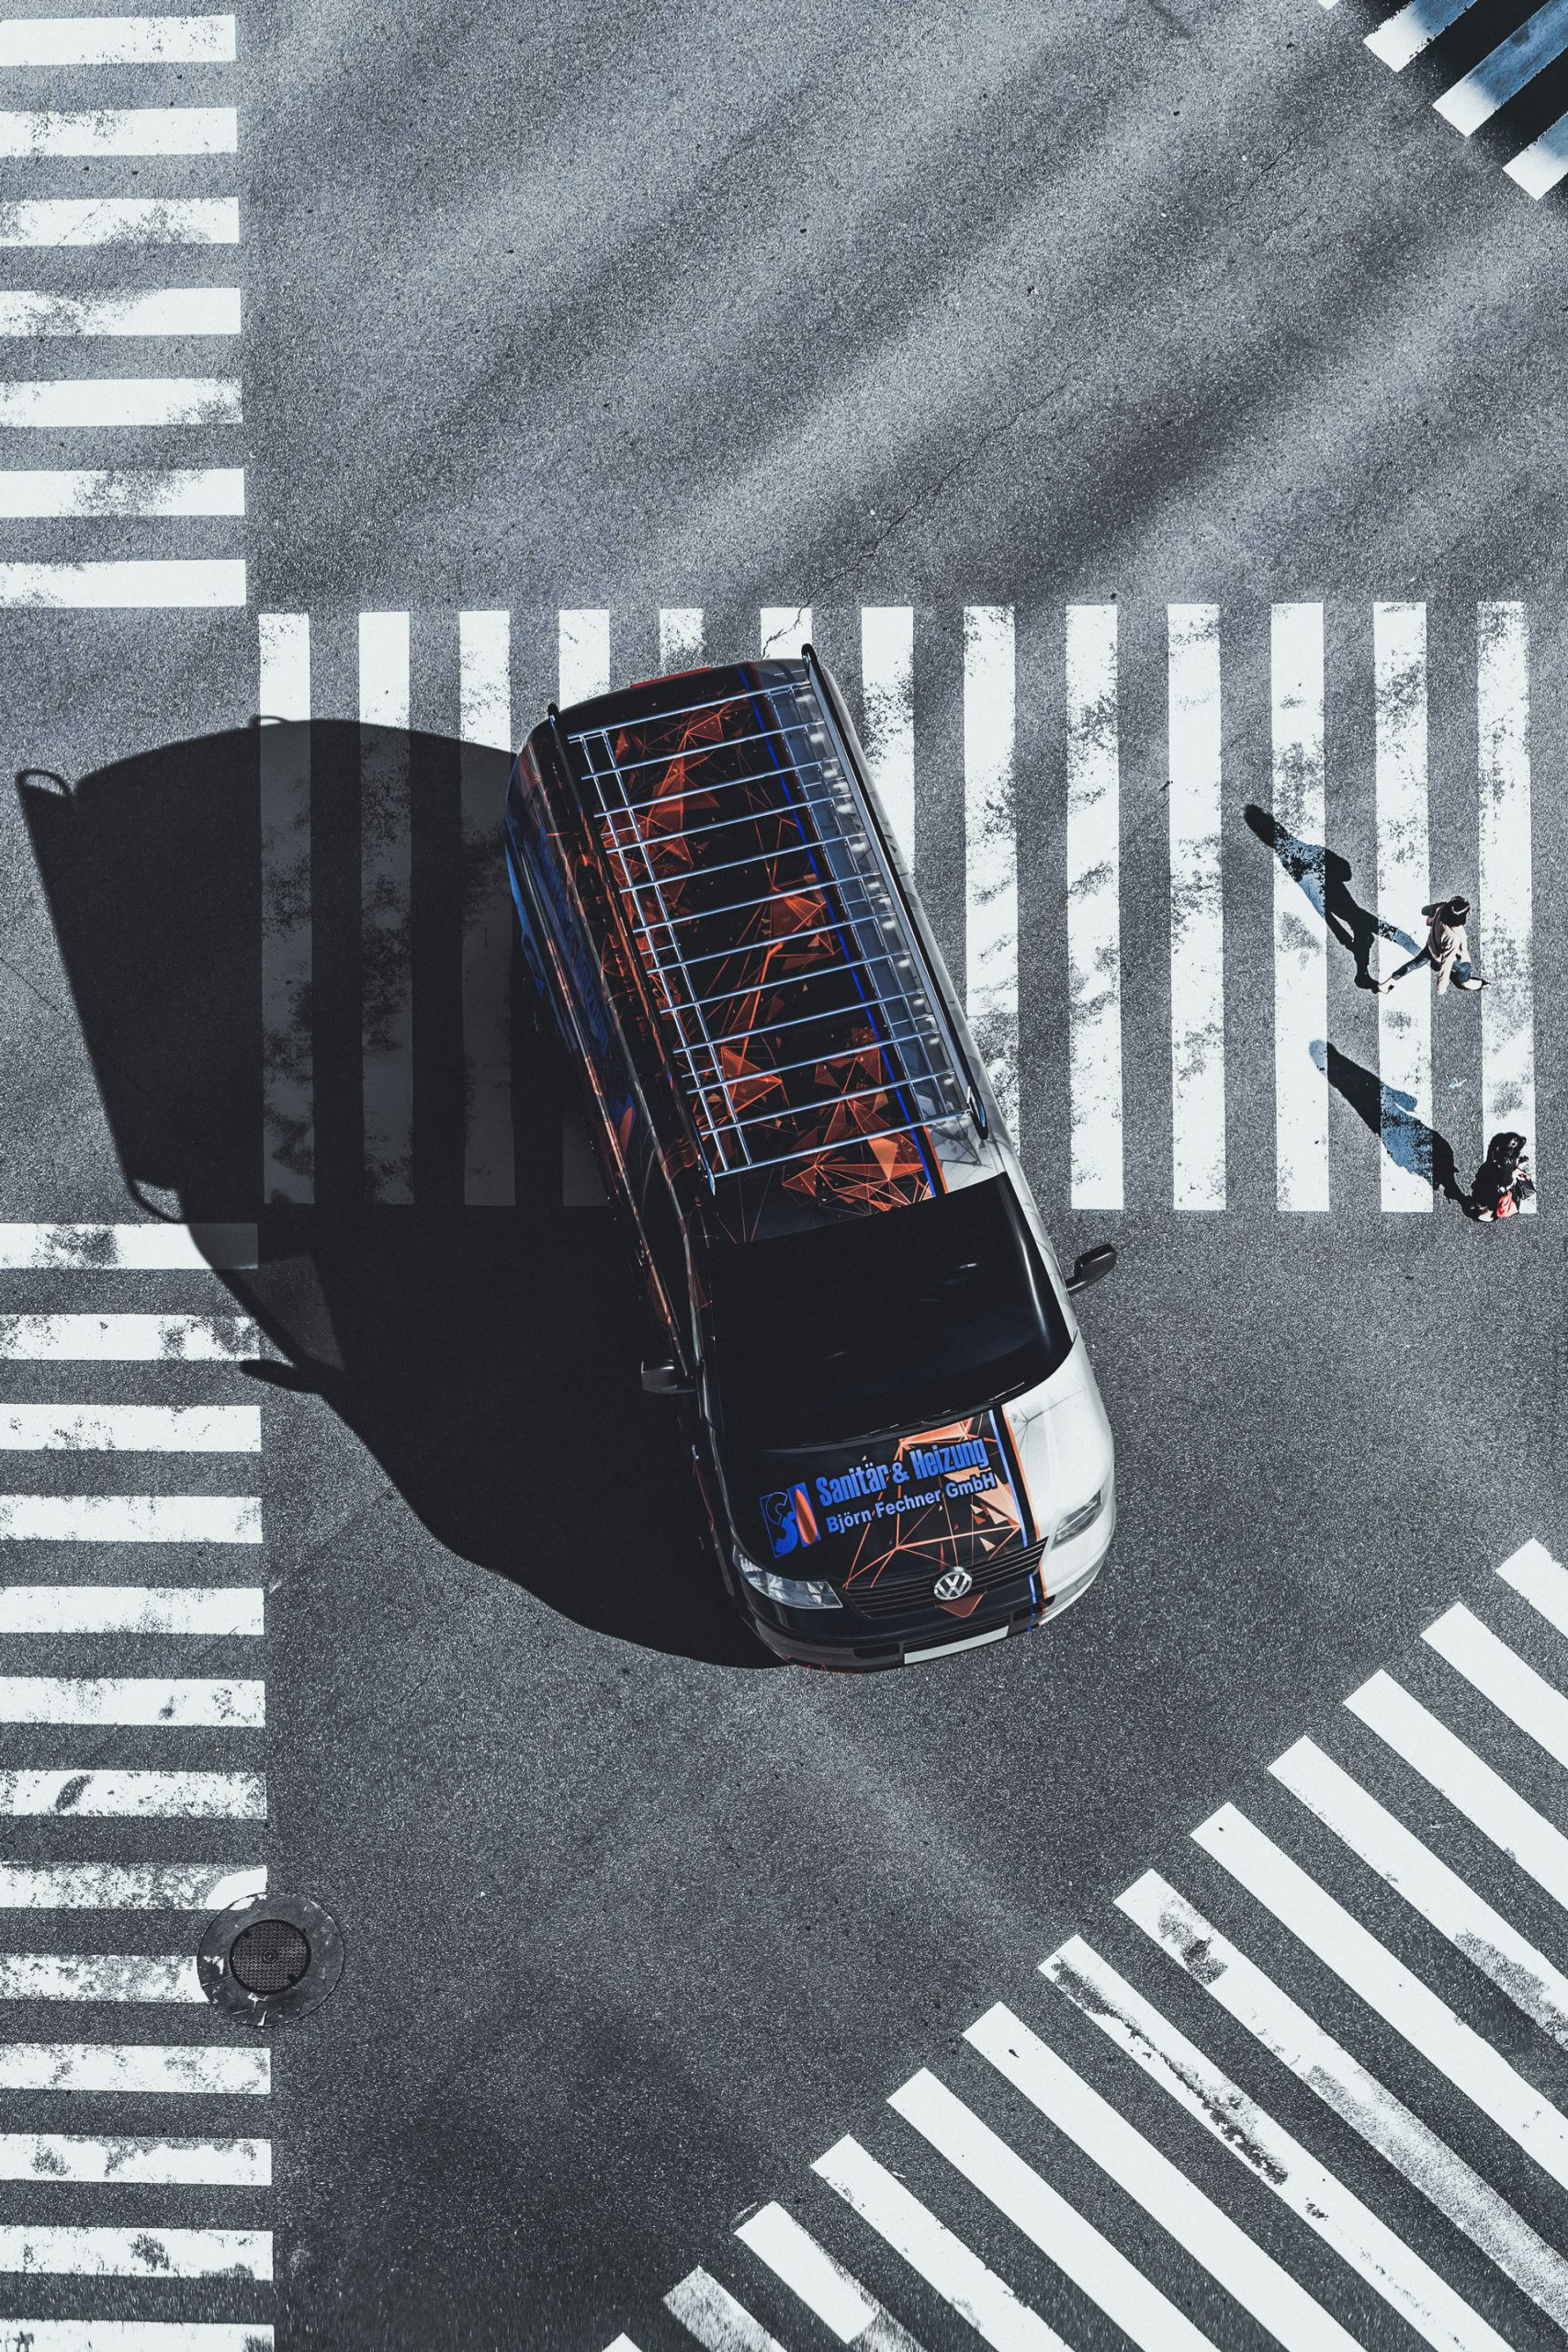 Volkswagen-Transporter-T5-by-Yagodesign-2020-RENDER